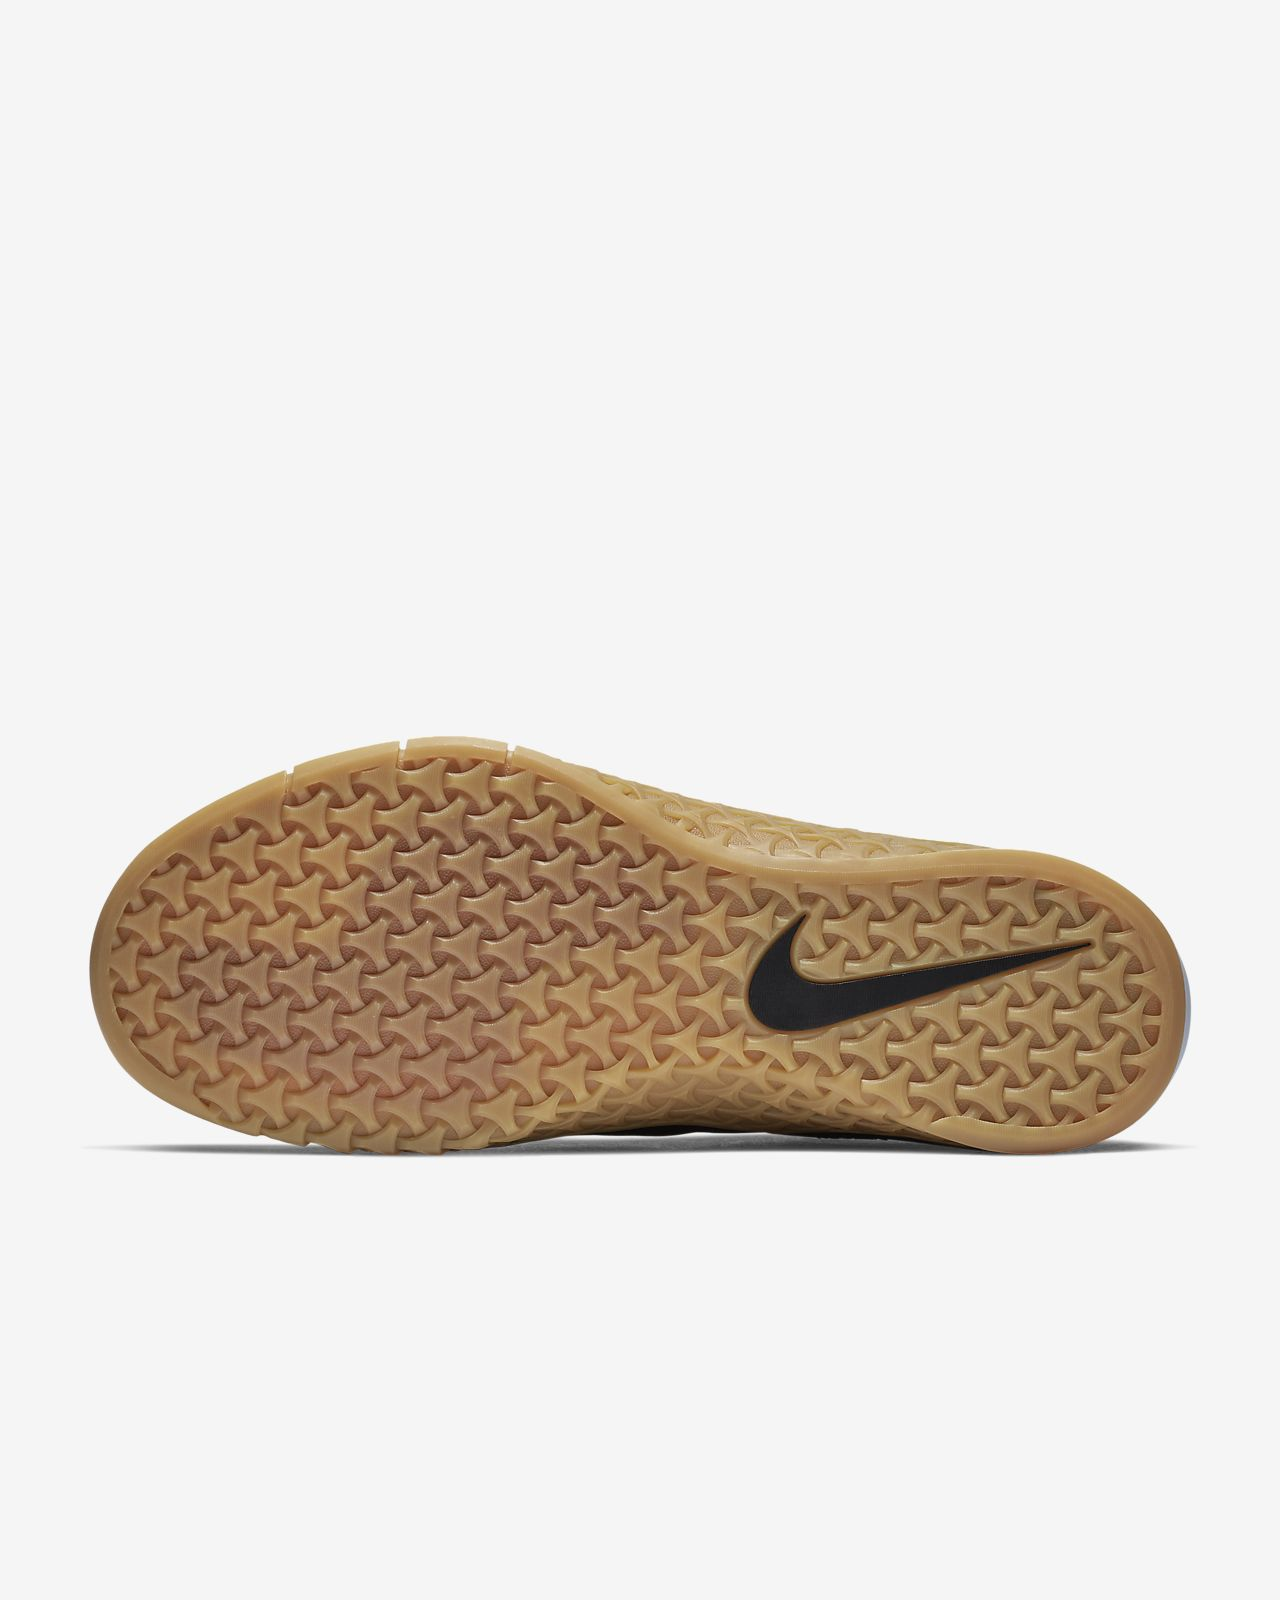 f7cec3aaed1c ... Nike Metcon 4 XD X Chalkboard Men s Cross-Training Weightlifting Shoe